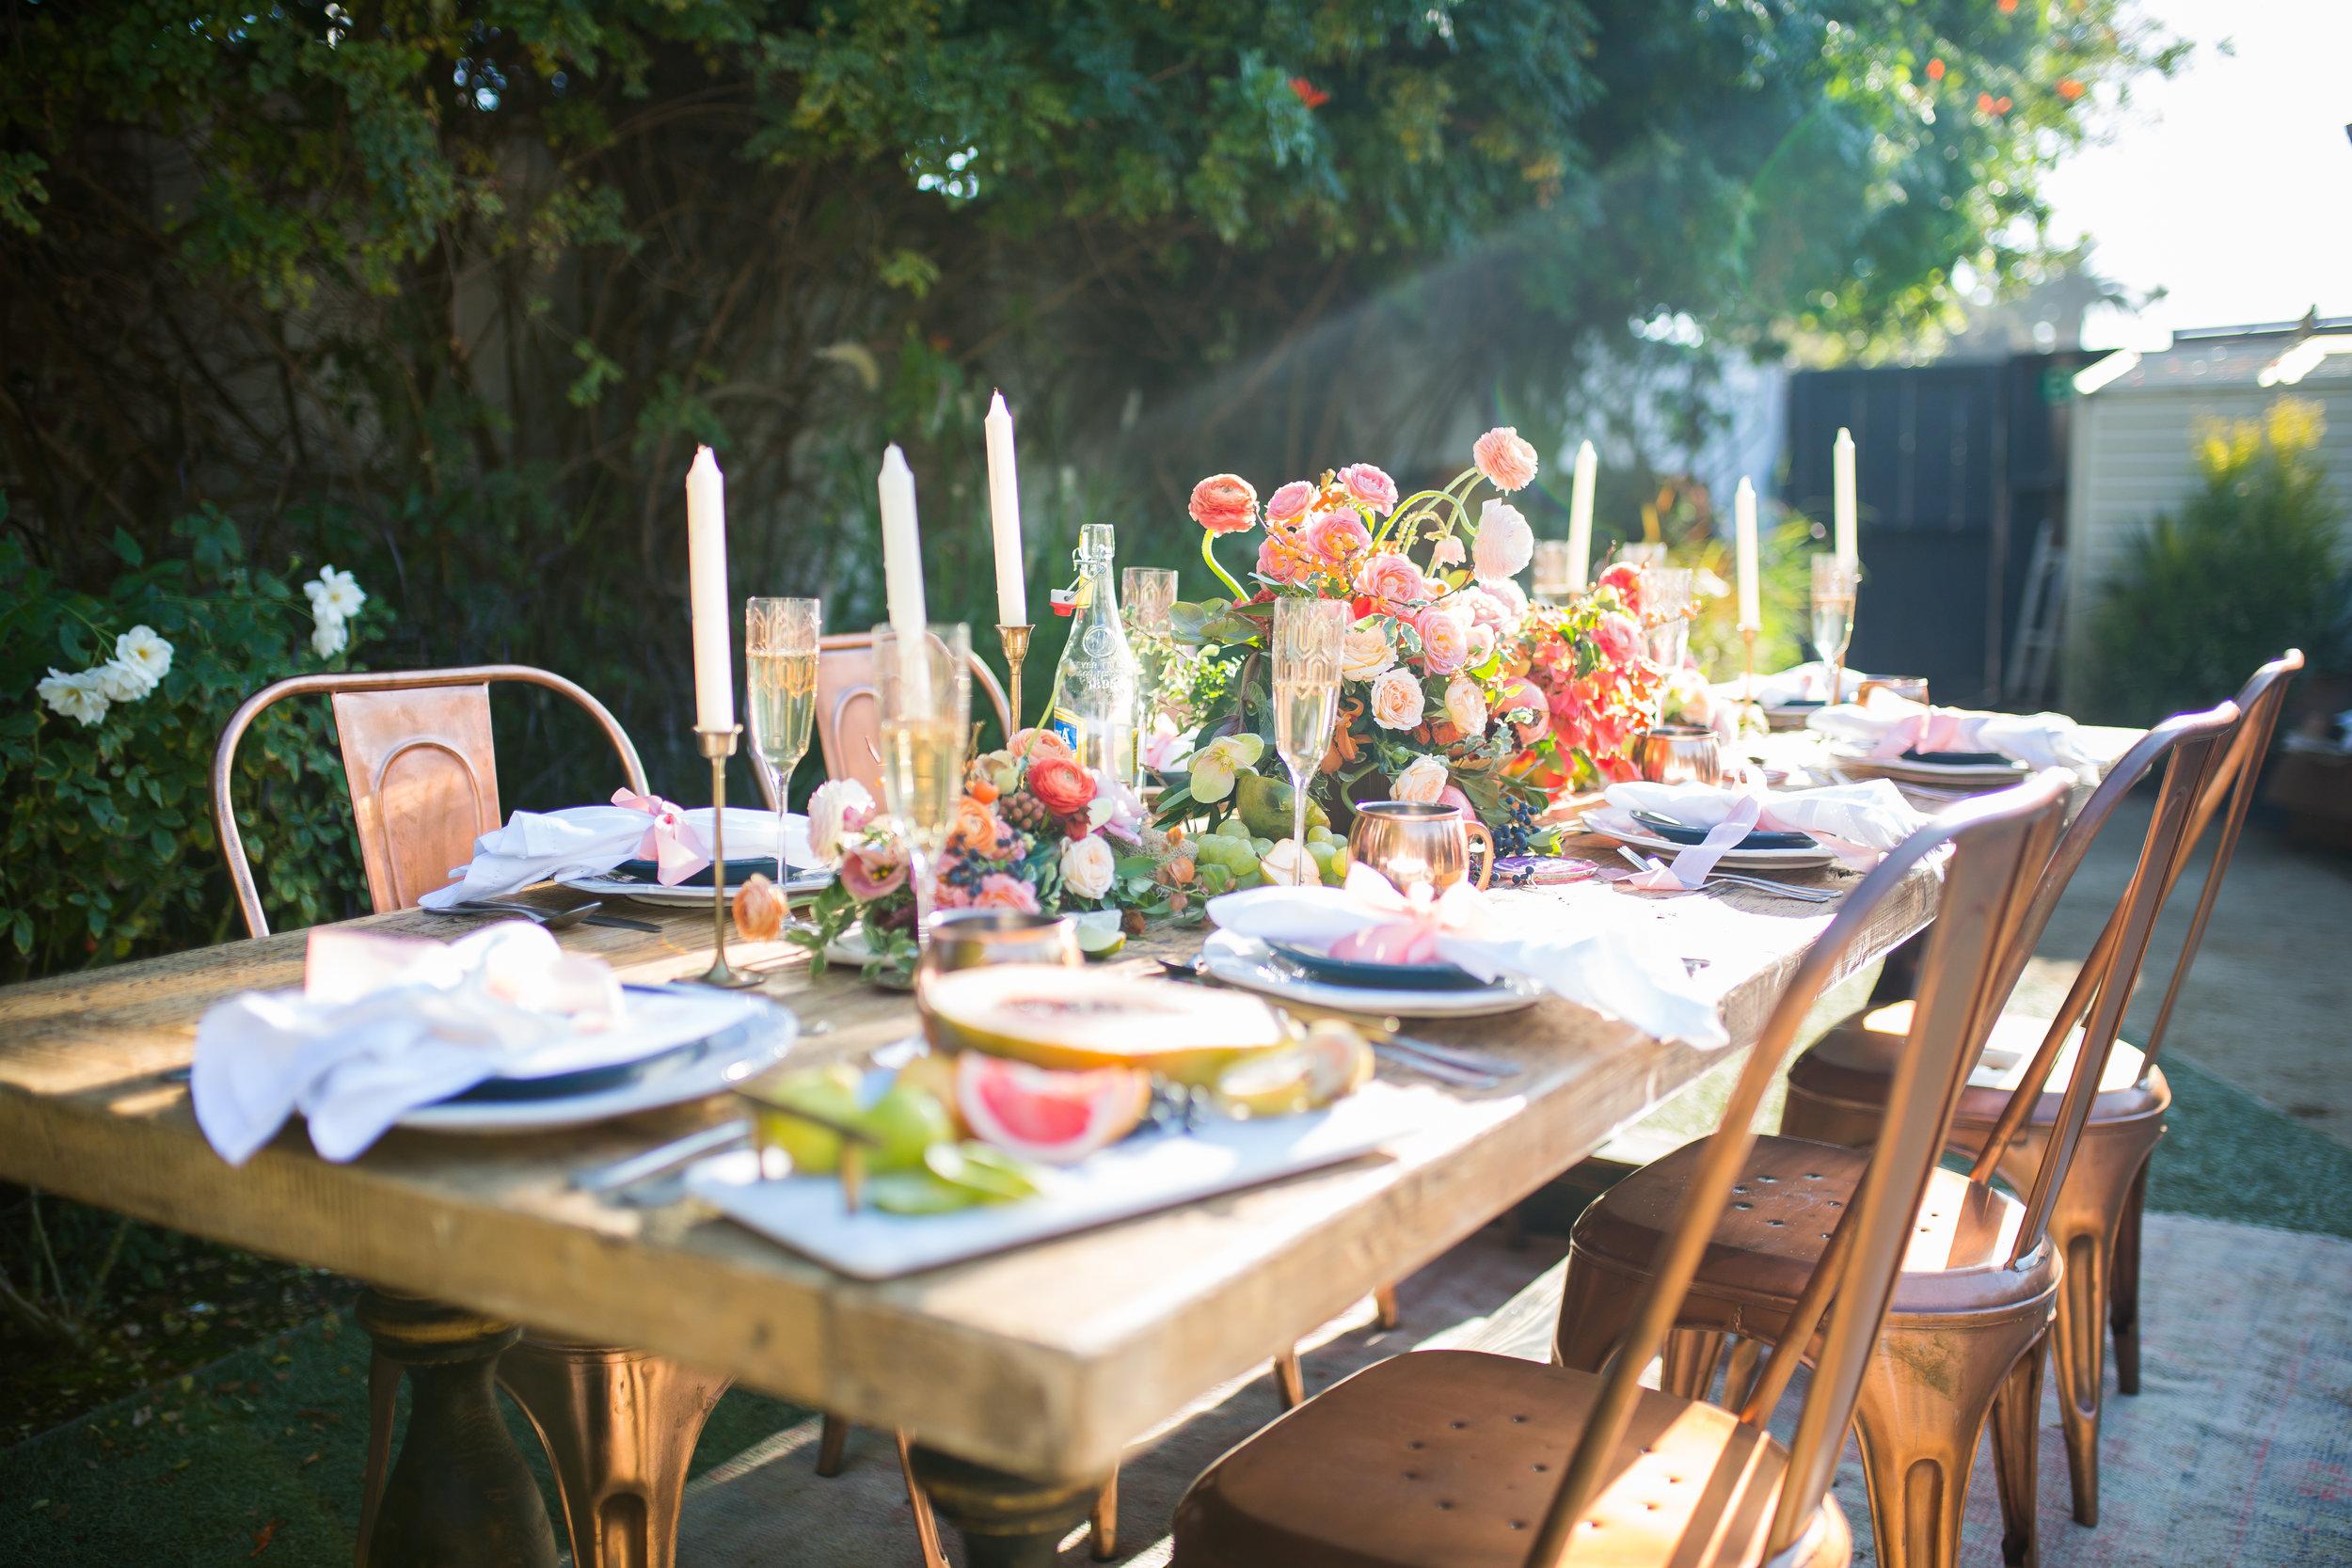 carsten_tice_orange_county_wedding_photographer-0691.jpg